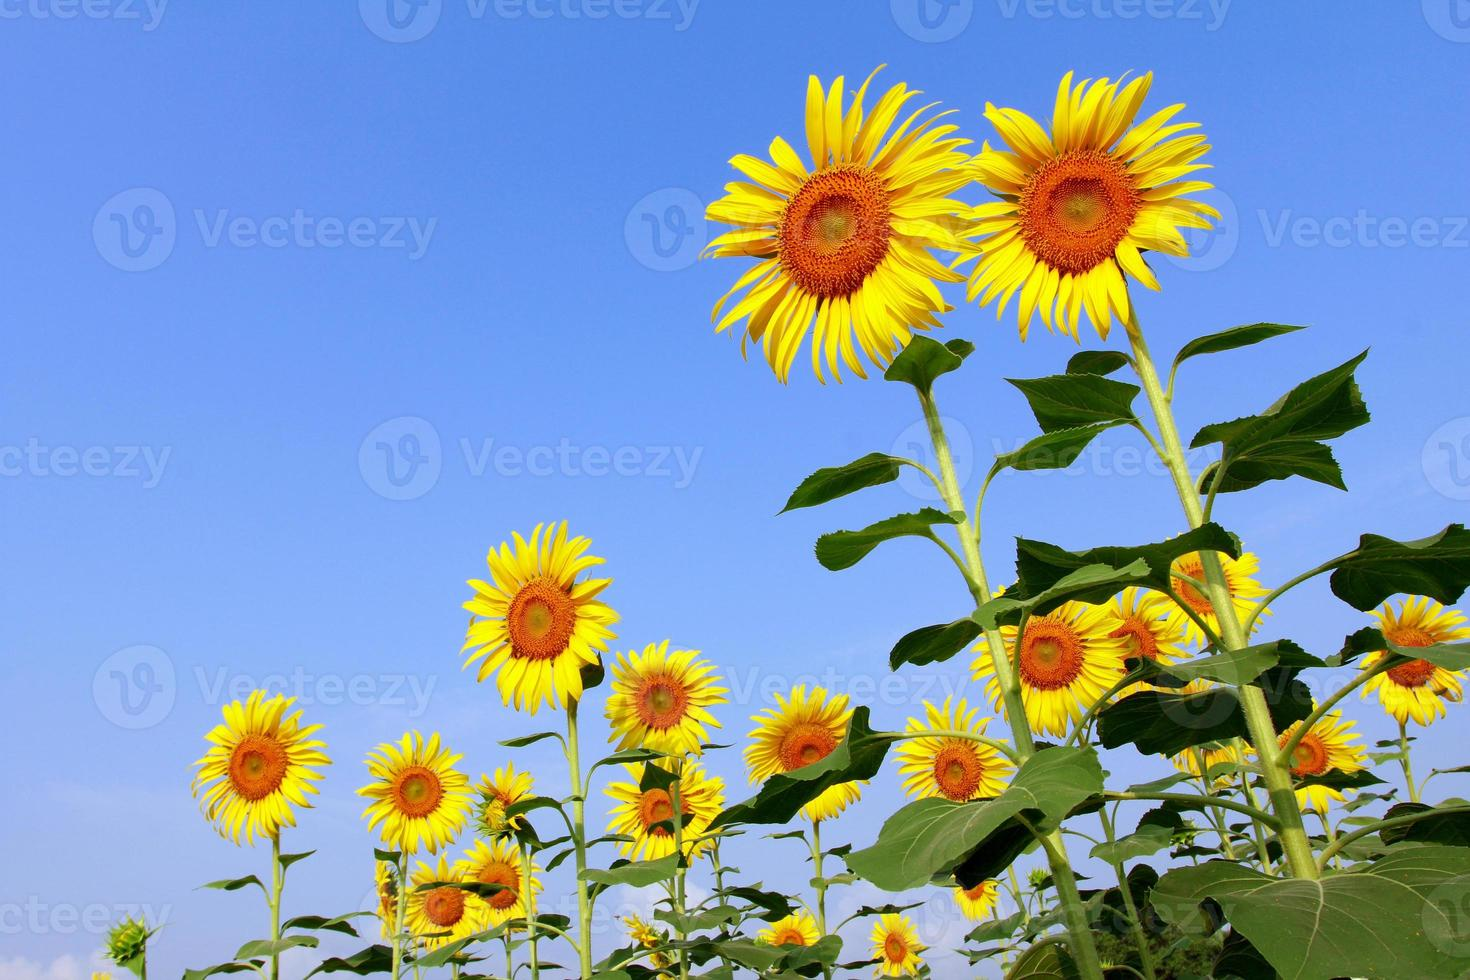 Sonnenblumenfeld mit blauem Himmel foto